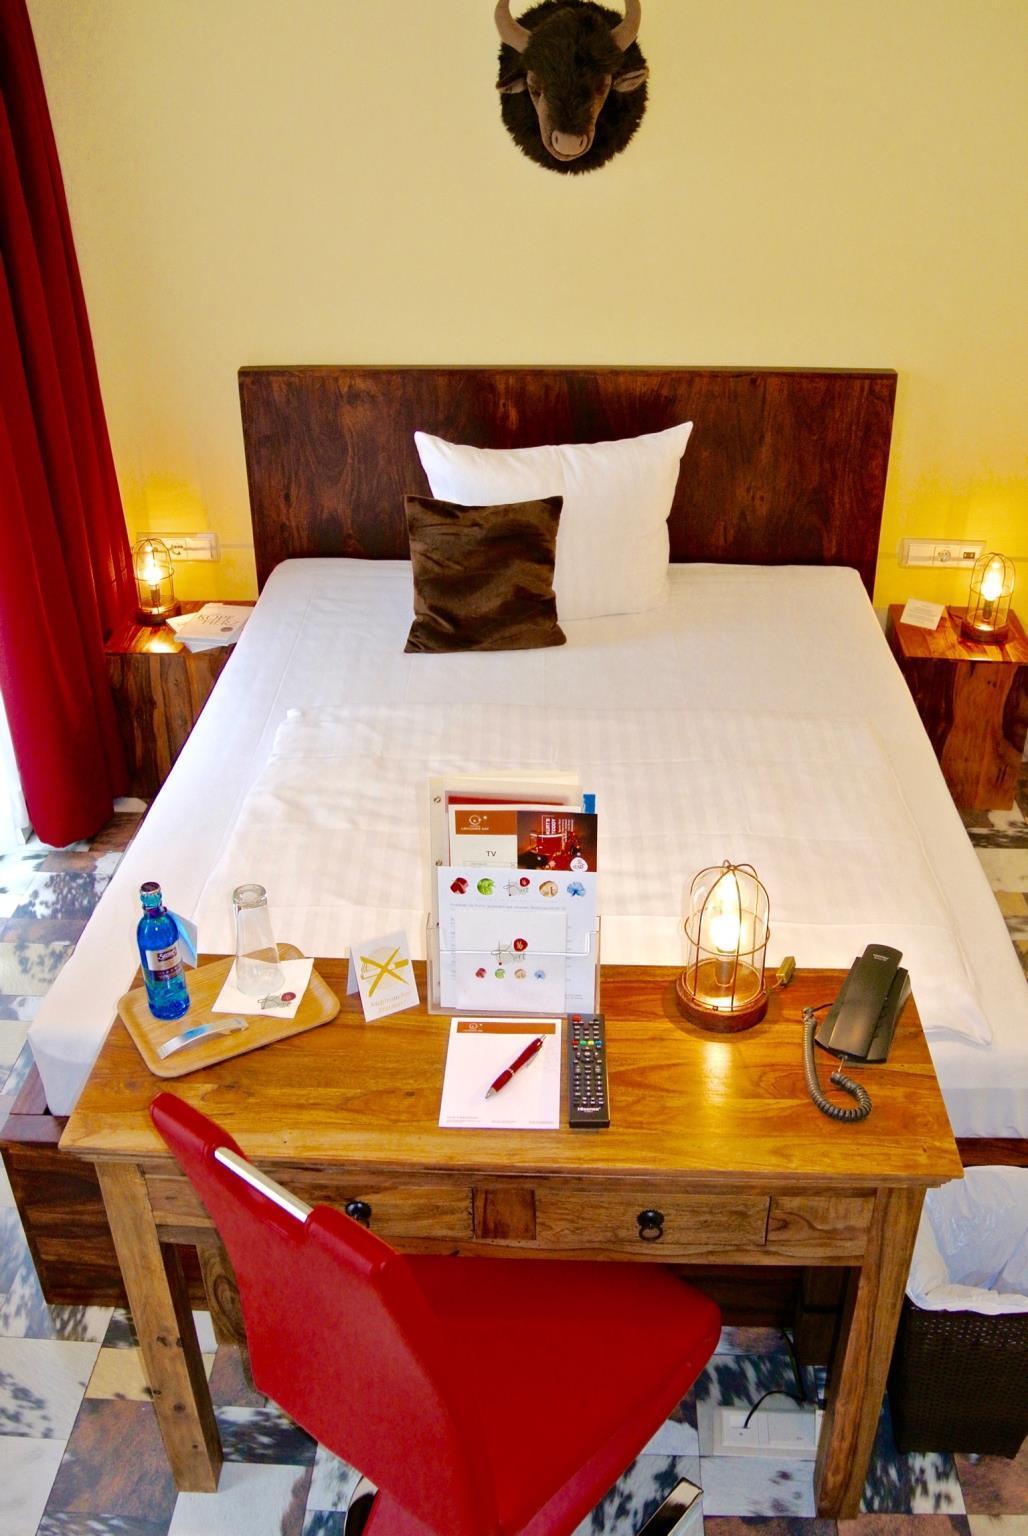 Wundervoll Hotel Loccumer Hof Hannover Referenz Von Economy Double Room